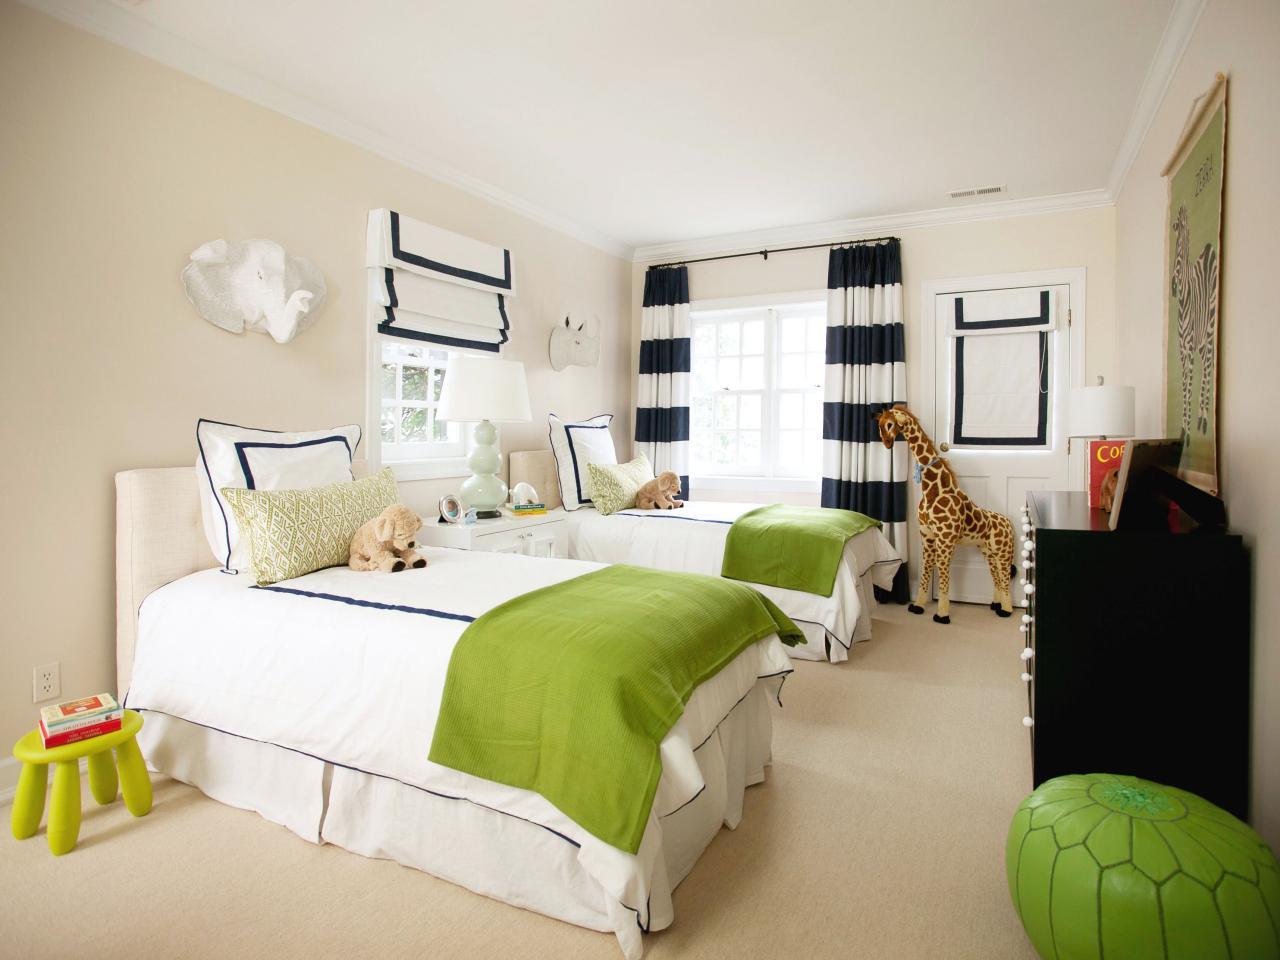 Plain Kids Bedroom Jungle Theme With Slide On Ideas